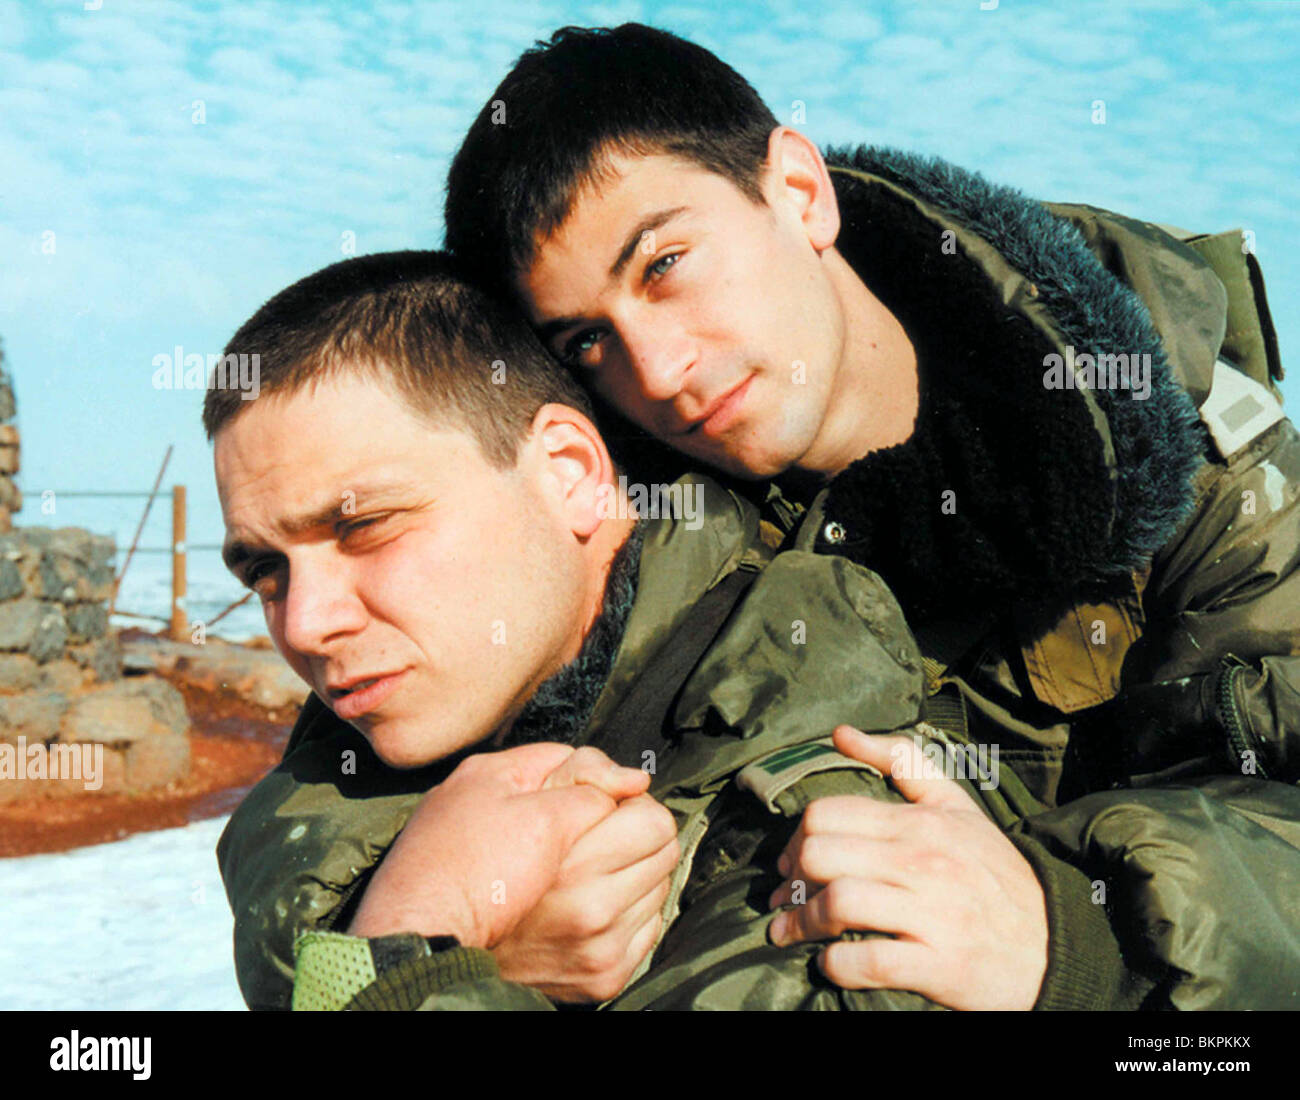 YOSSI & JAGGER (2002) OHAD KNOLLER, YEHUDA LEVI EYTAN FOX (DIR) YOJA 002 - Stock Image